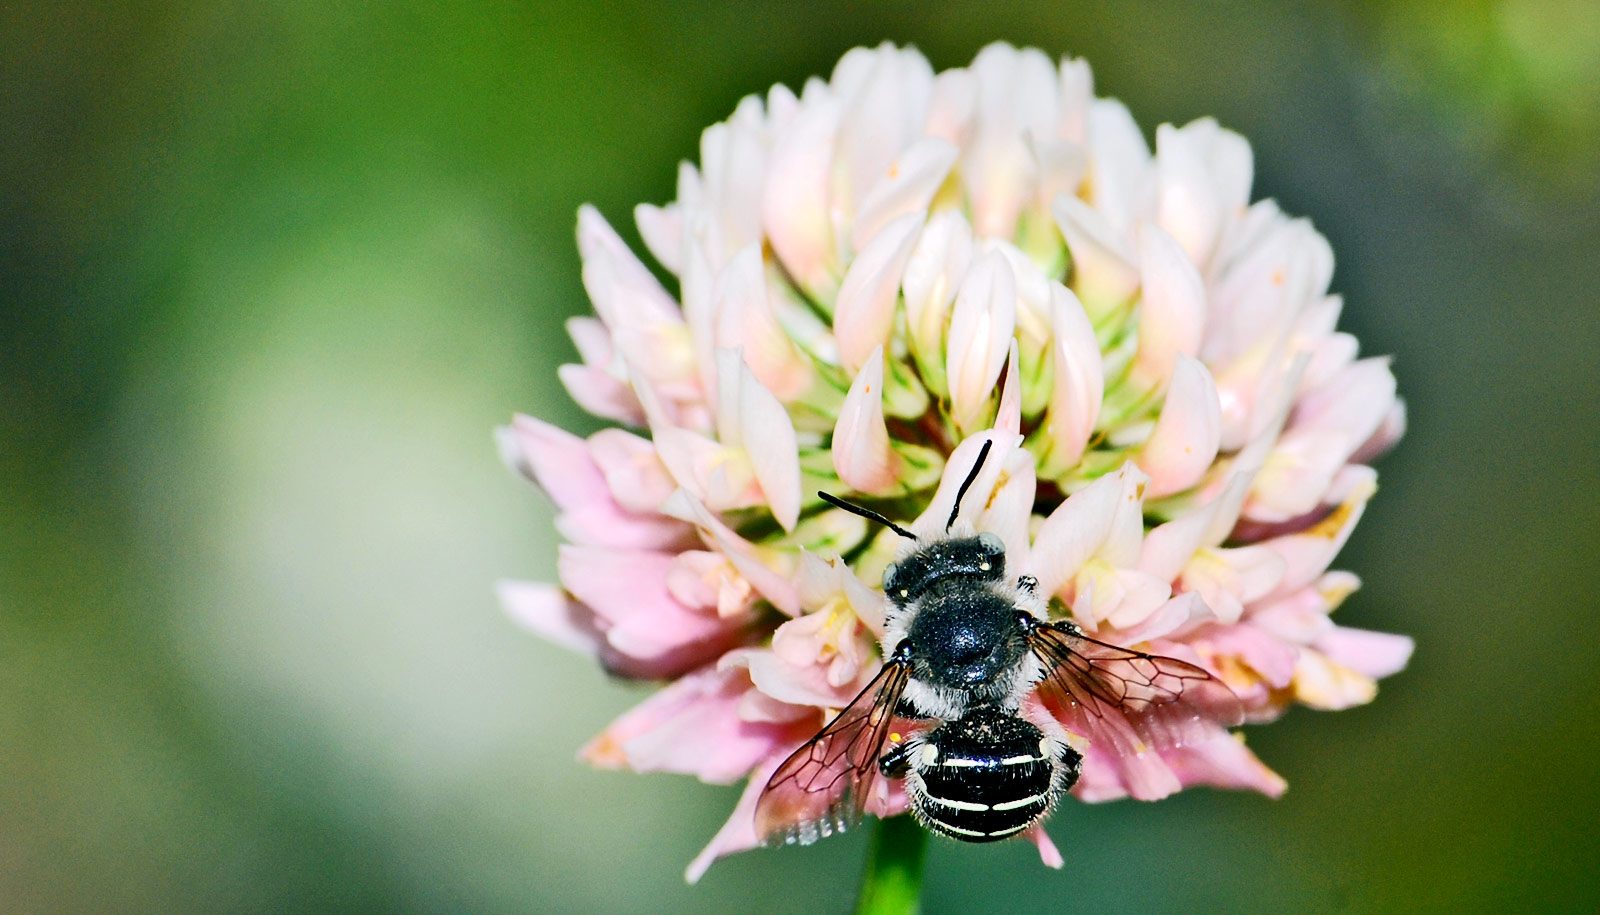 5 ways a 'lazy' lawn makes pollinators happy